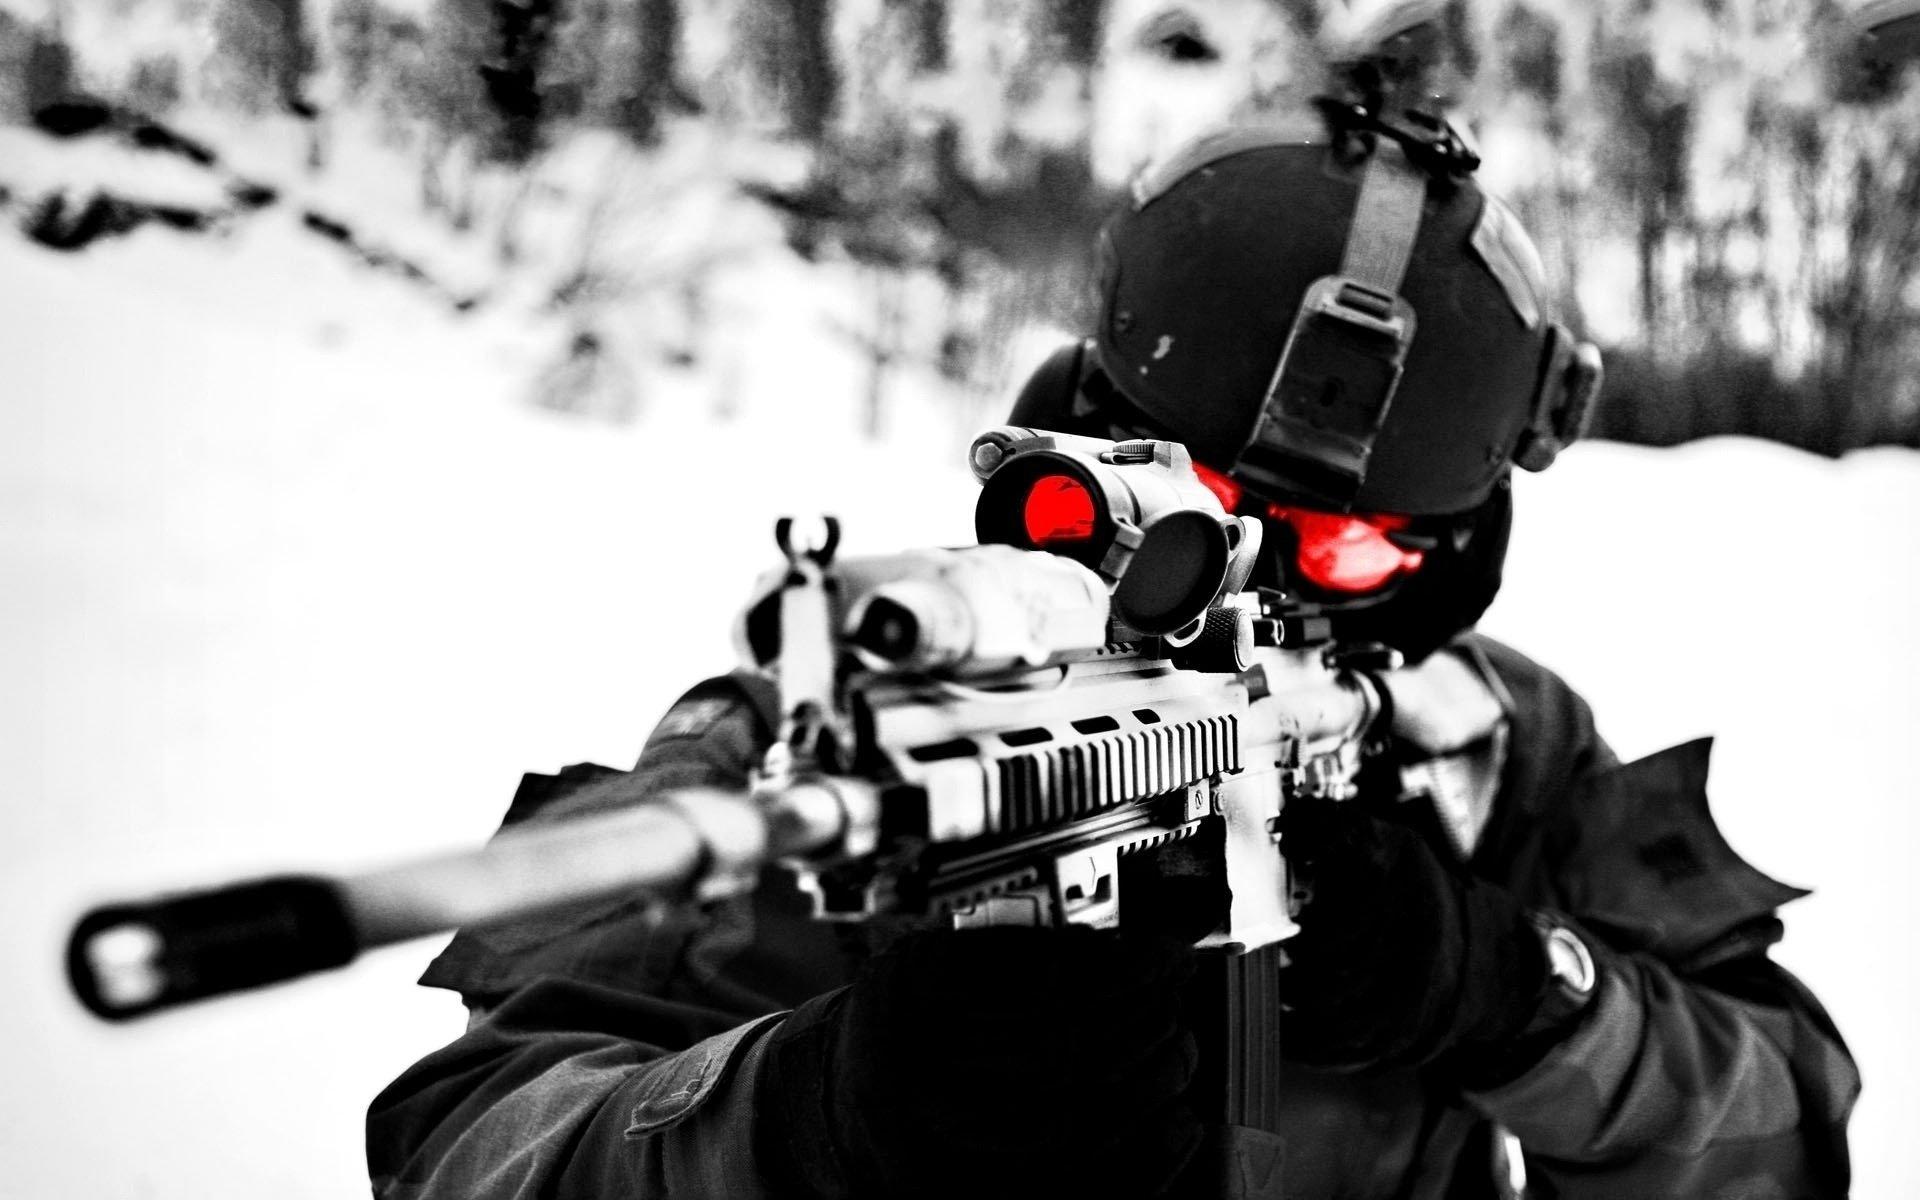 57 Call of Duty Modern Warfare 2 HD Wallpapers